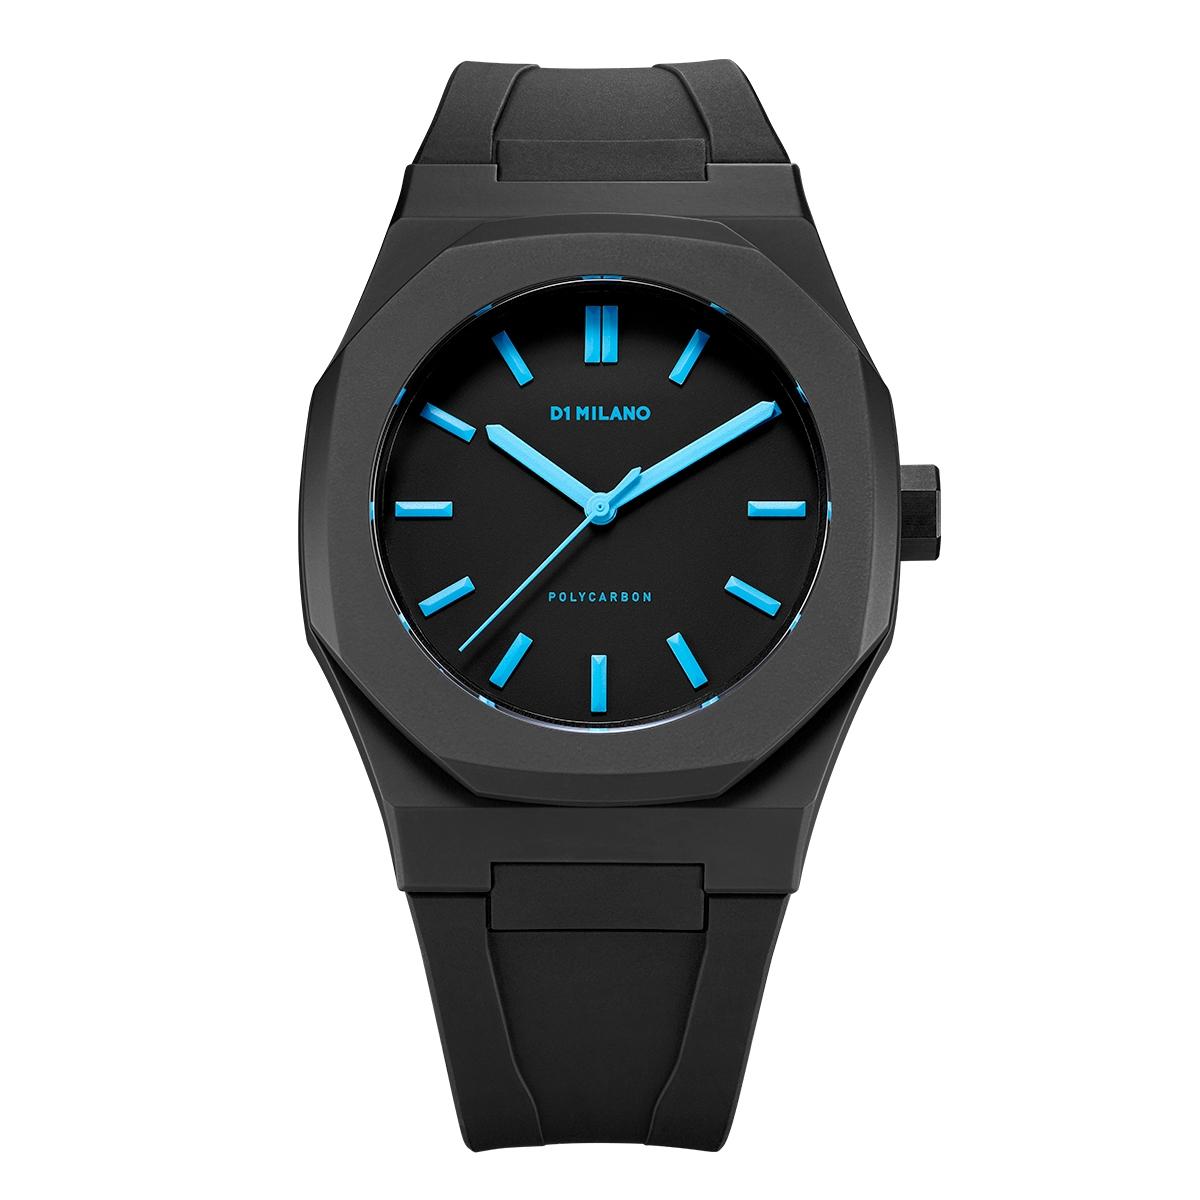 D1ミラノPCRJ07 Neon Watch Black with Blue Index with rubber strap 腕時計 メンズ レディース 有名人 愛用D1 MILANO ディーワン ミラノ 代引き 手数料無料 ギフト プレゼント クリスマス 誕生日 記念日 贈り物 人気 おしゃれ ペア 祝い セール 結婚式 お呼ばれ